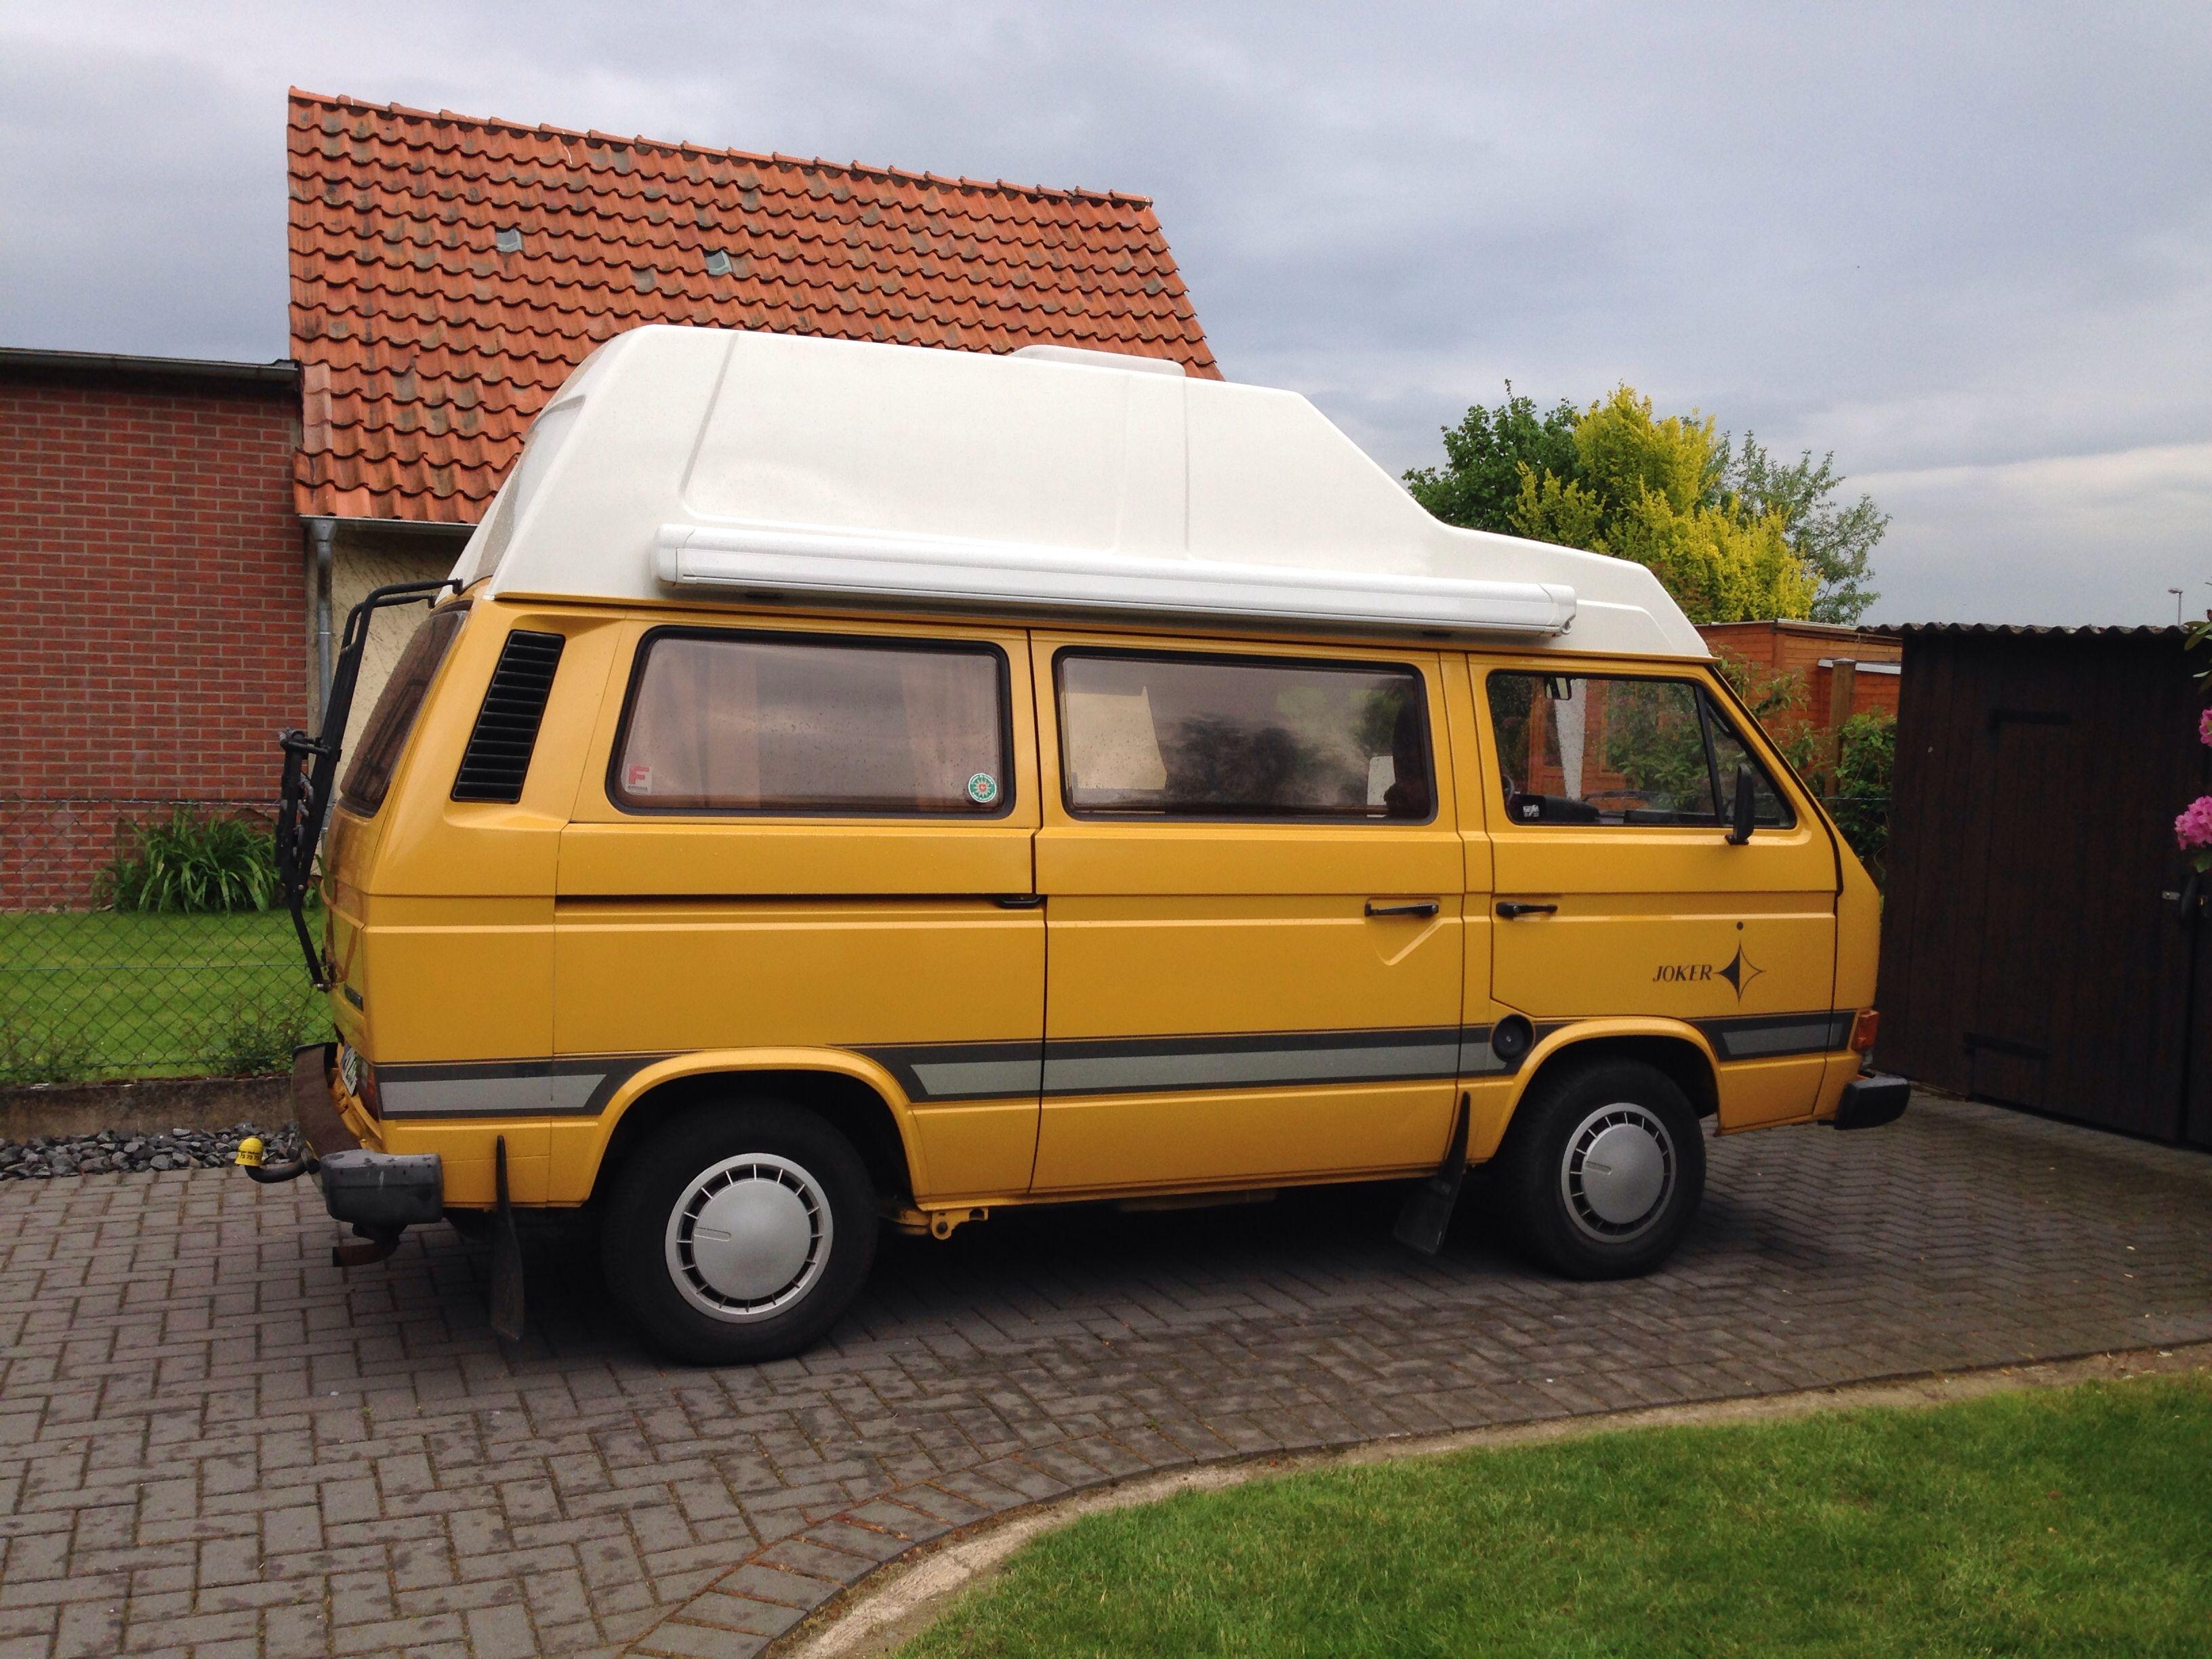 volkswagen t3 joker westfalia c l torii pinterest volkswagen vw and cars. Black Bedroom Furniture Sets. Home Design Ideas